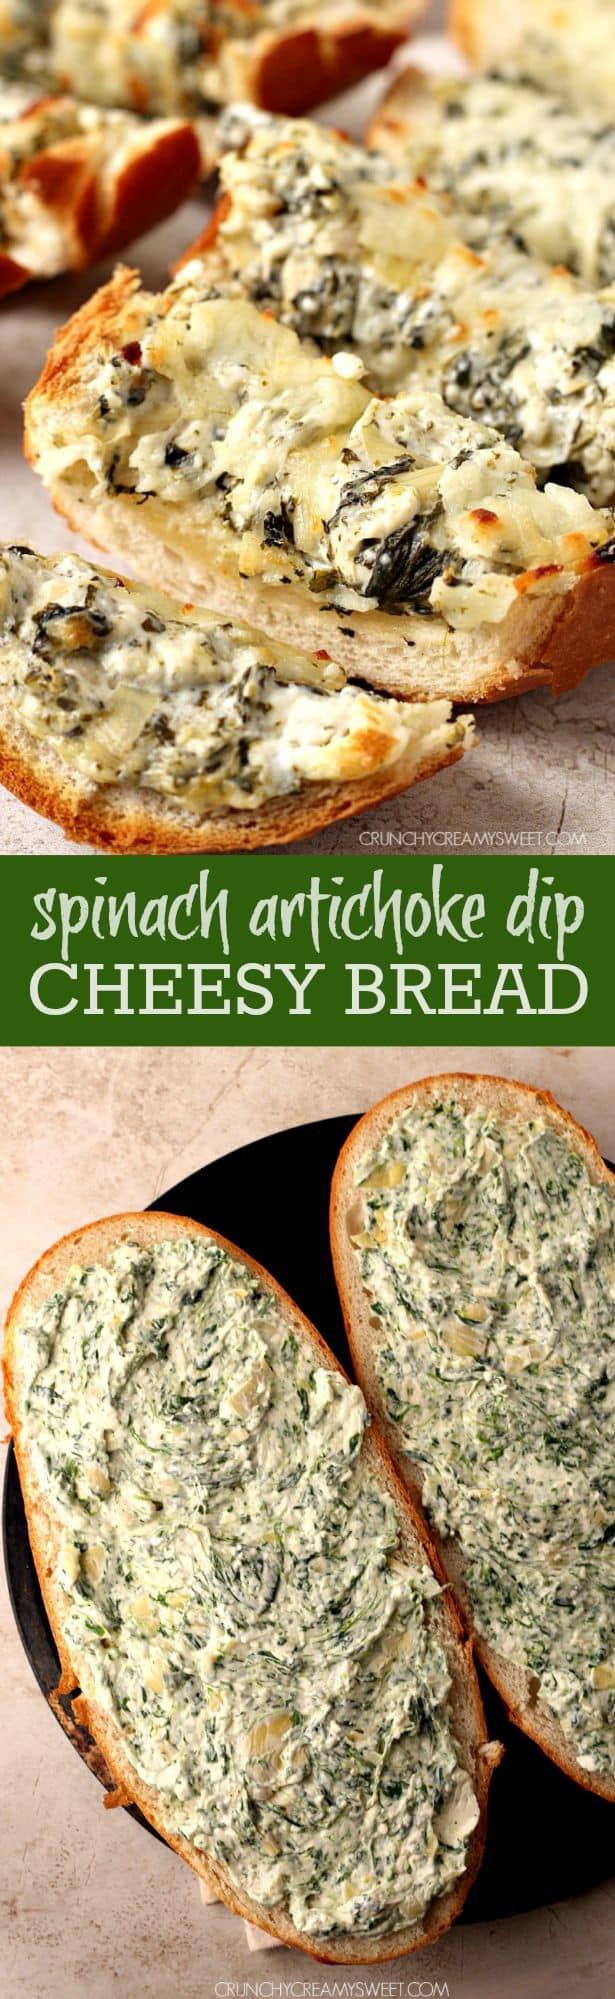 spinach artichoke dip cheesy bread long Spinach Artichoke Dip Cheesy Bread